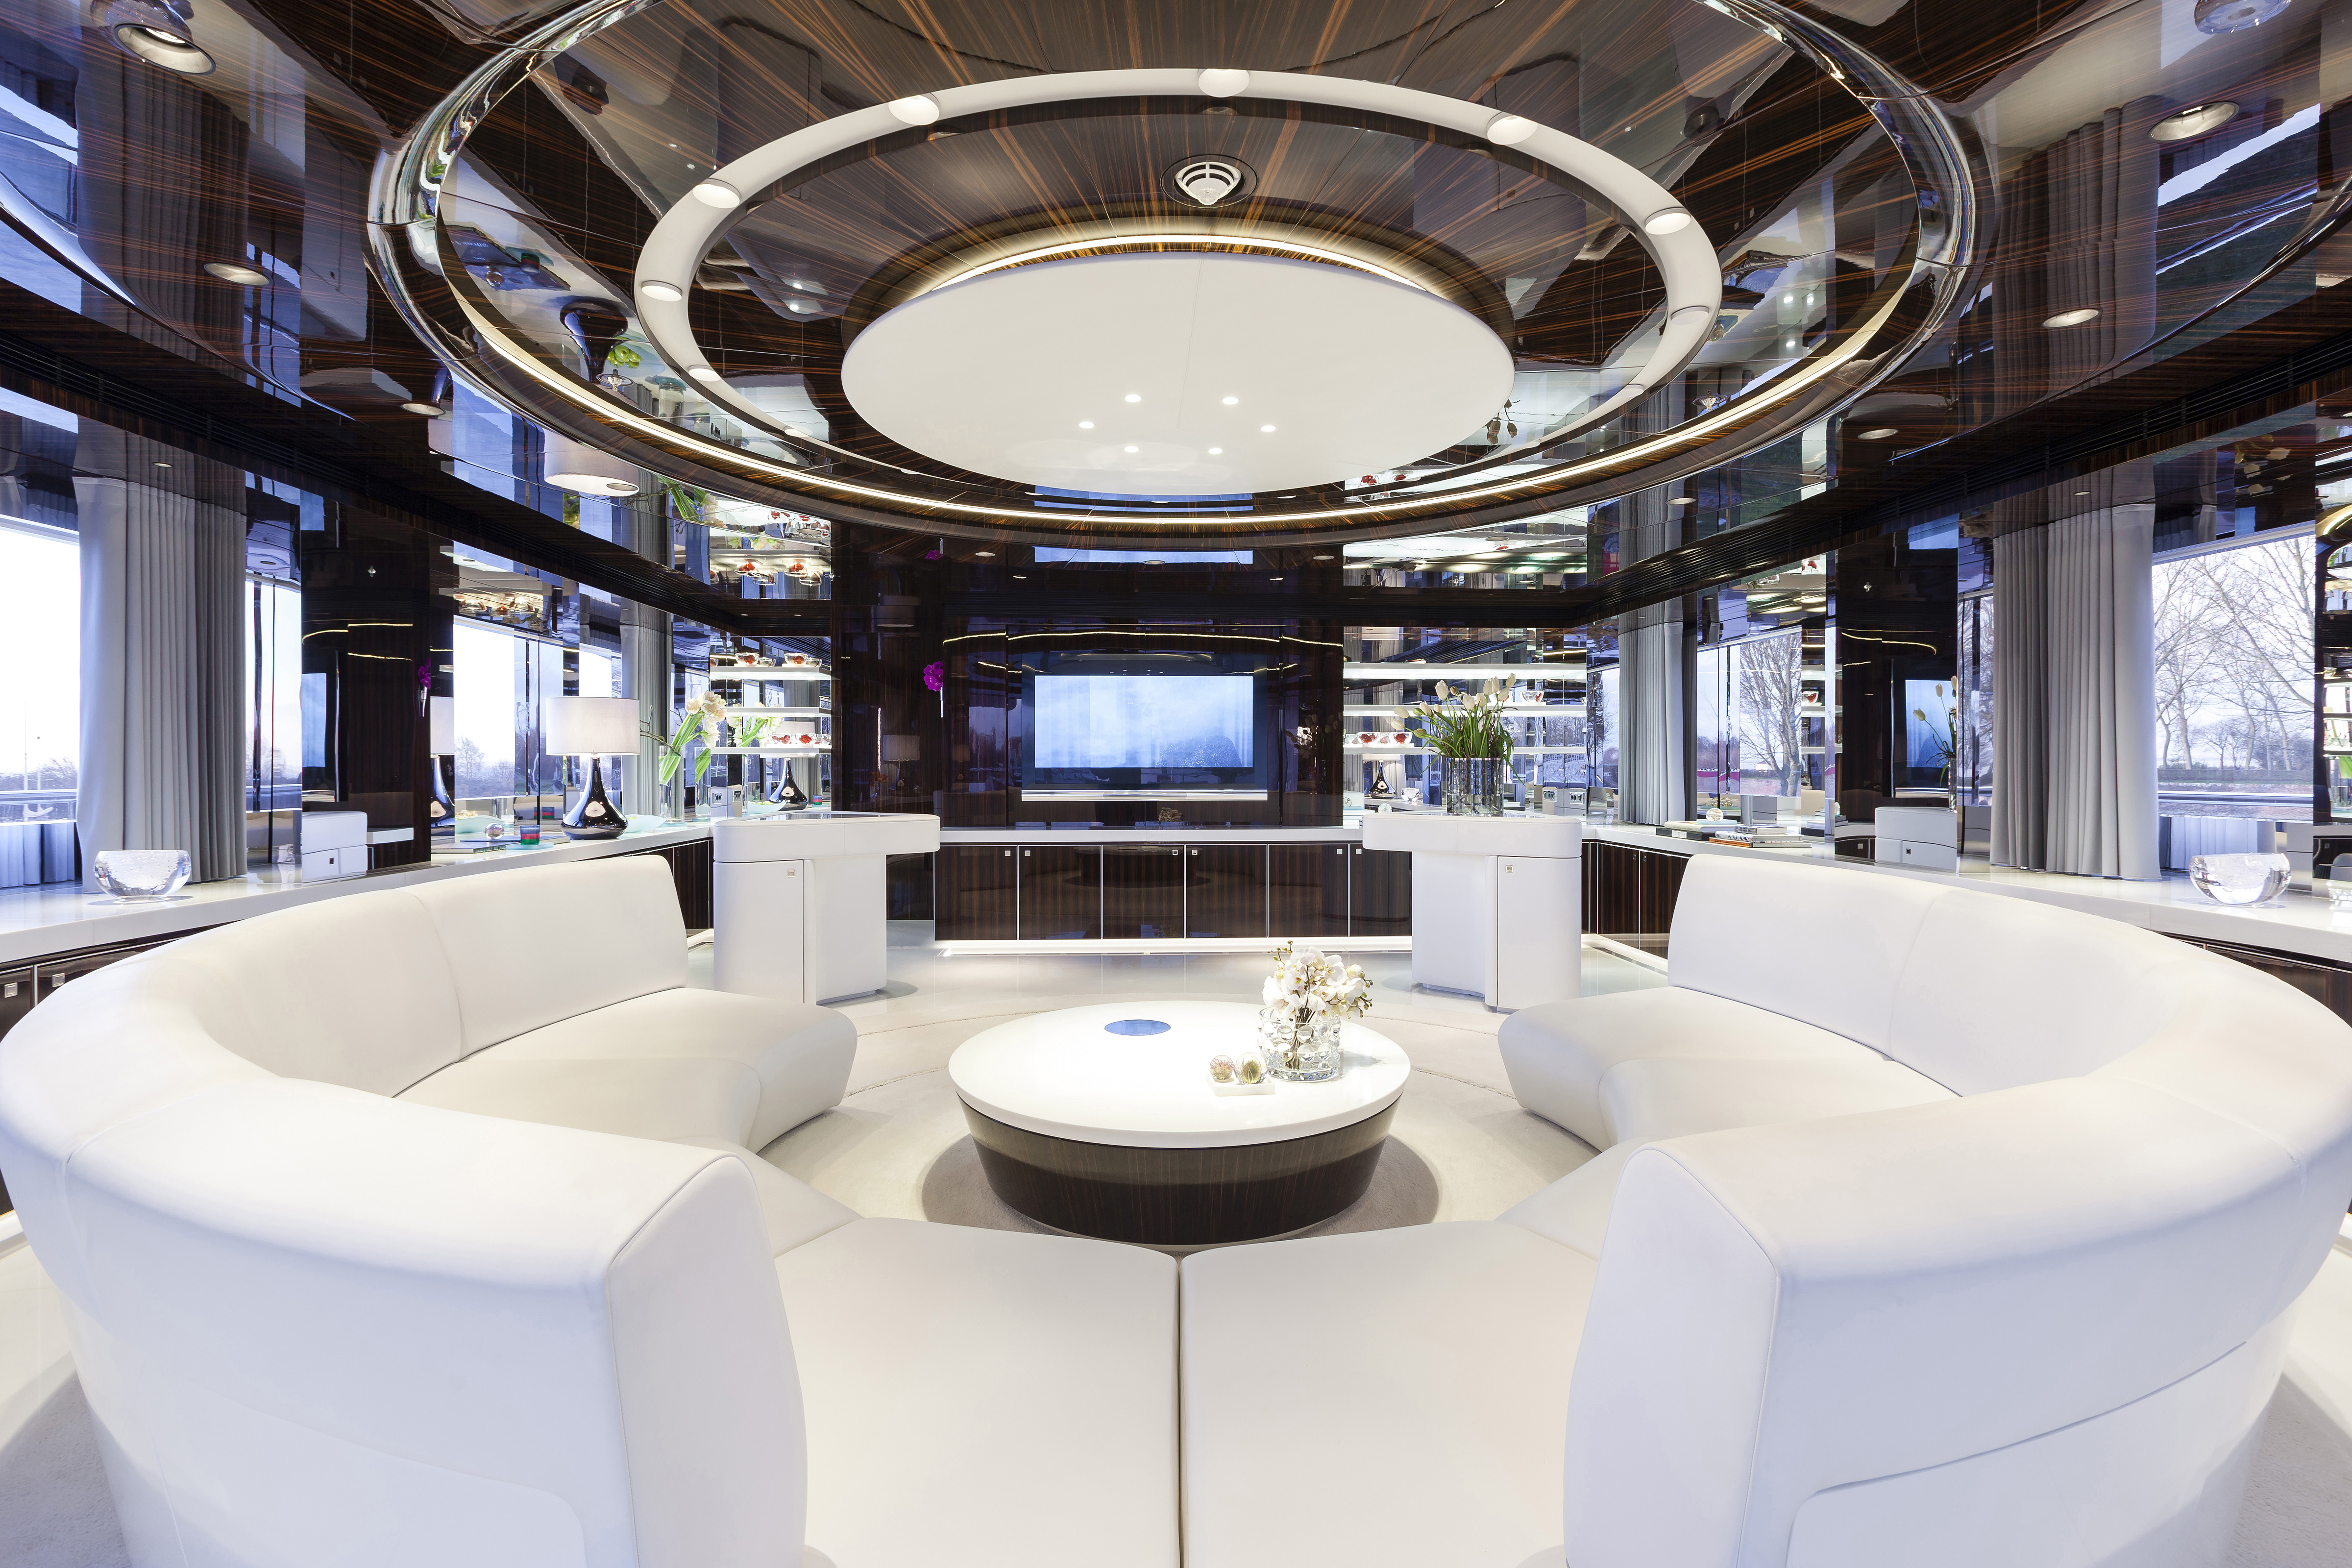 Jacht MySky Designed by Erick van Egeraat. Foto Dick Holthuis